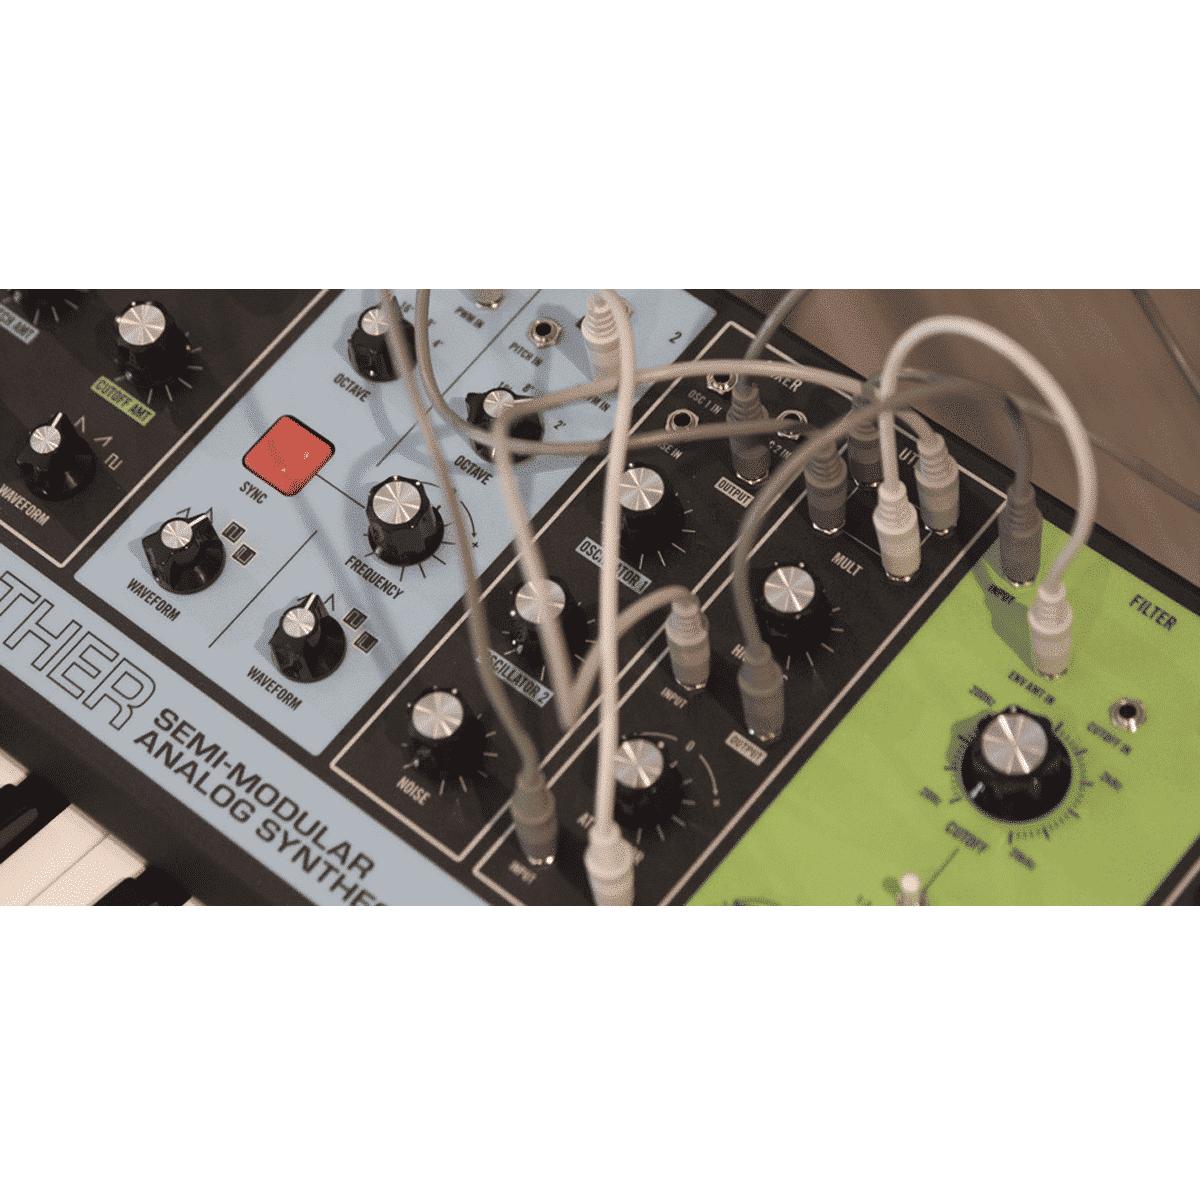 moog grandmother 4 Sintetizzatori e Drum Machine, Sintetizzatori e Tastiere, Synth a tastiera